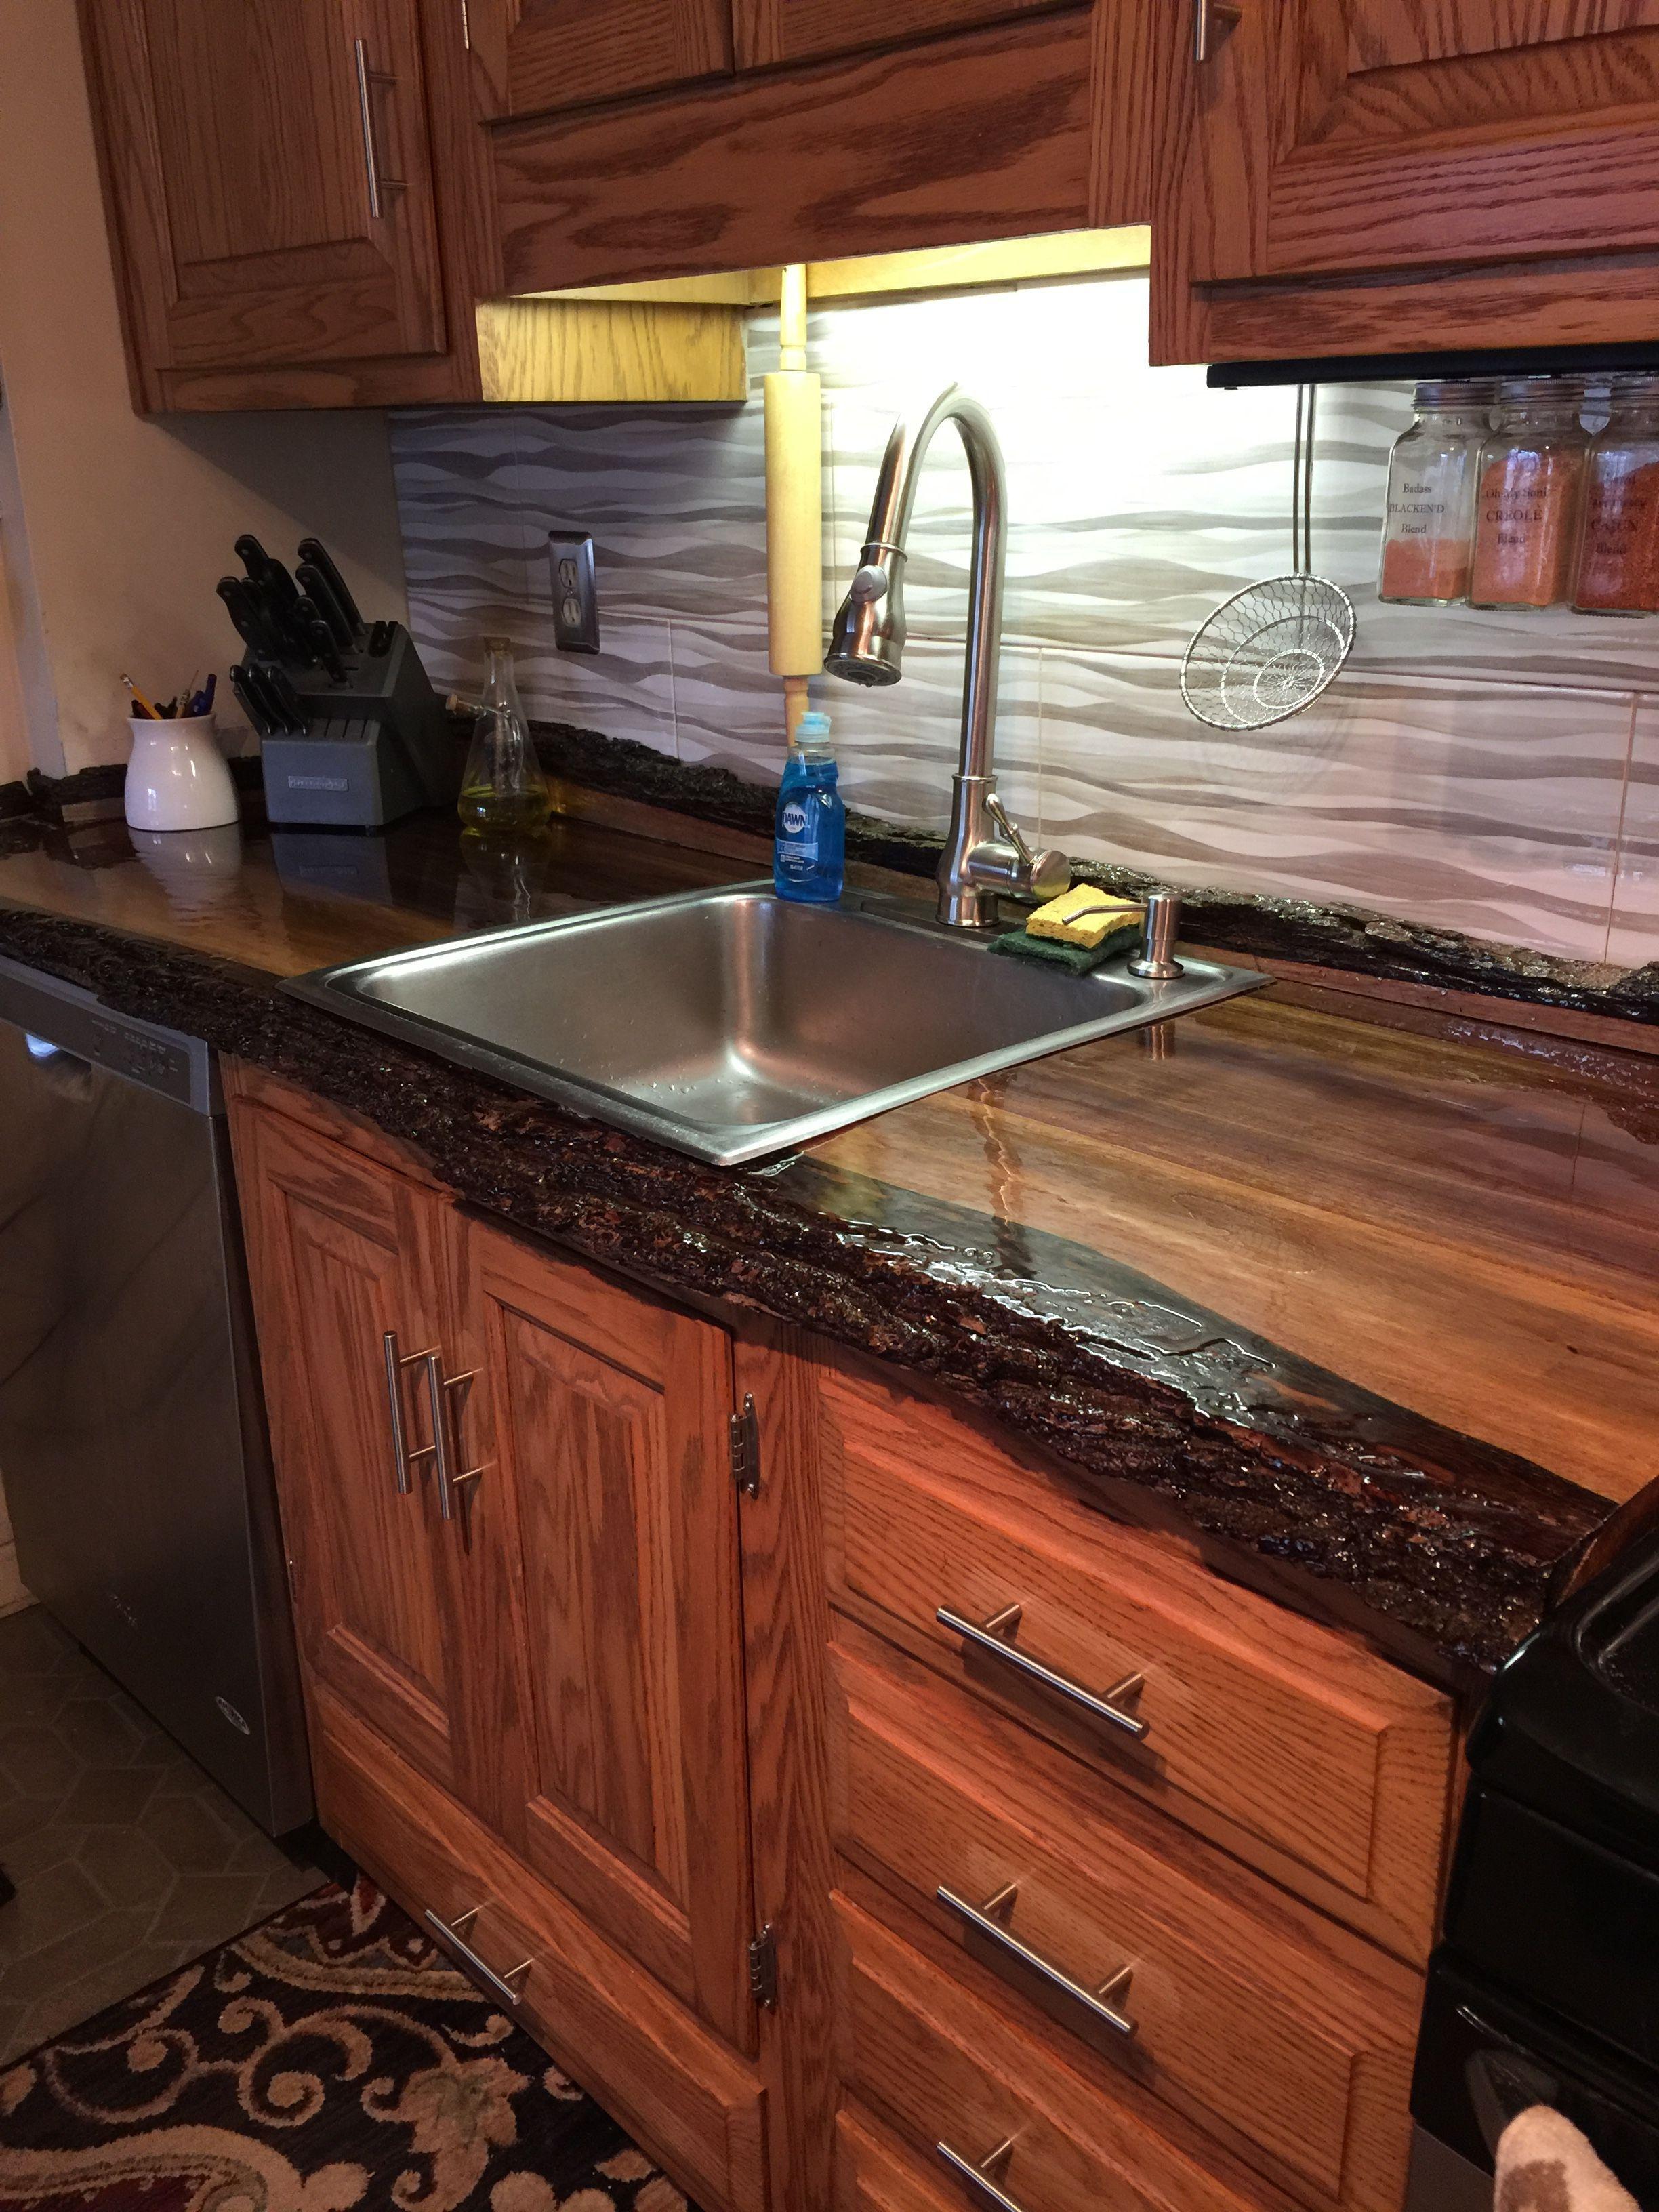 Live Edge Wood Black Walnut Kitchen Countertop Walnut Kitchen Lake House Kitchen Wooden Countertops Kitchen